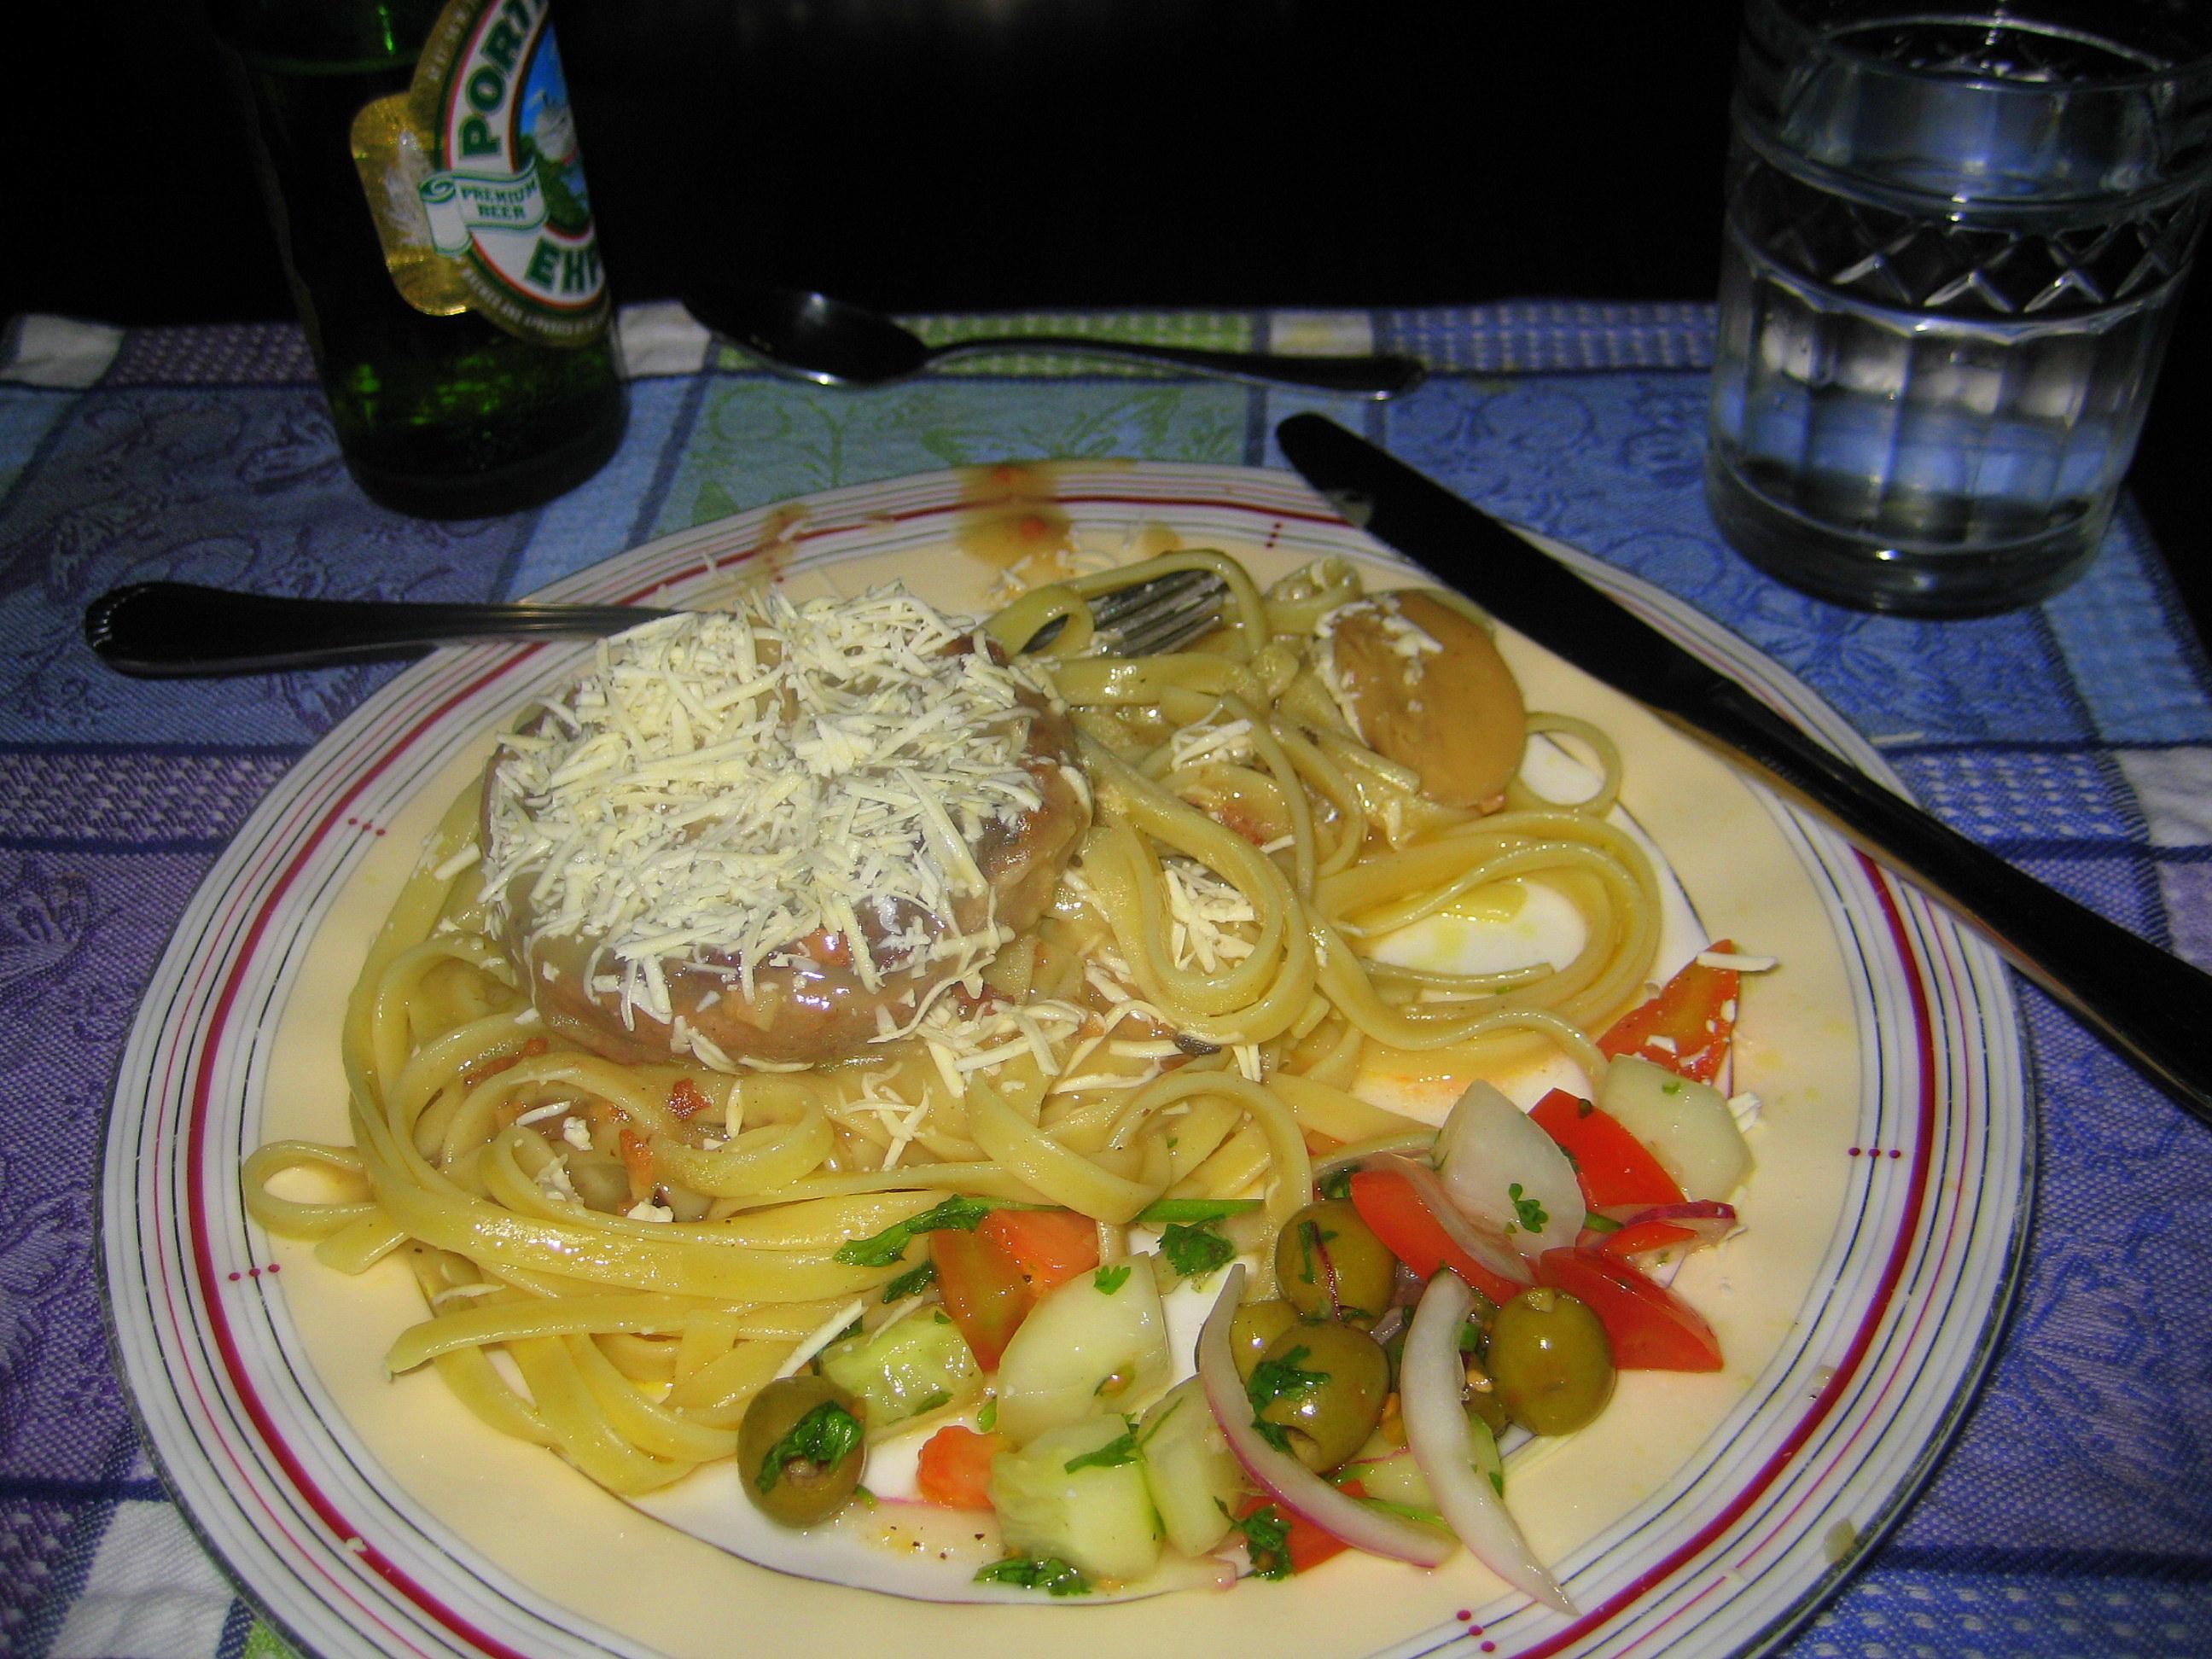 Steak and noodles.